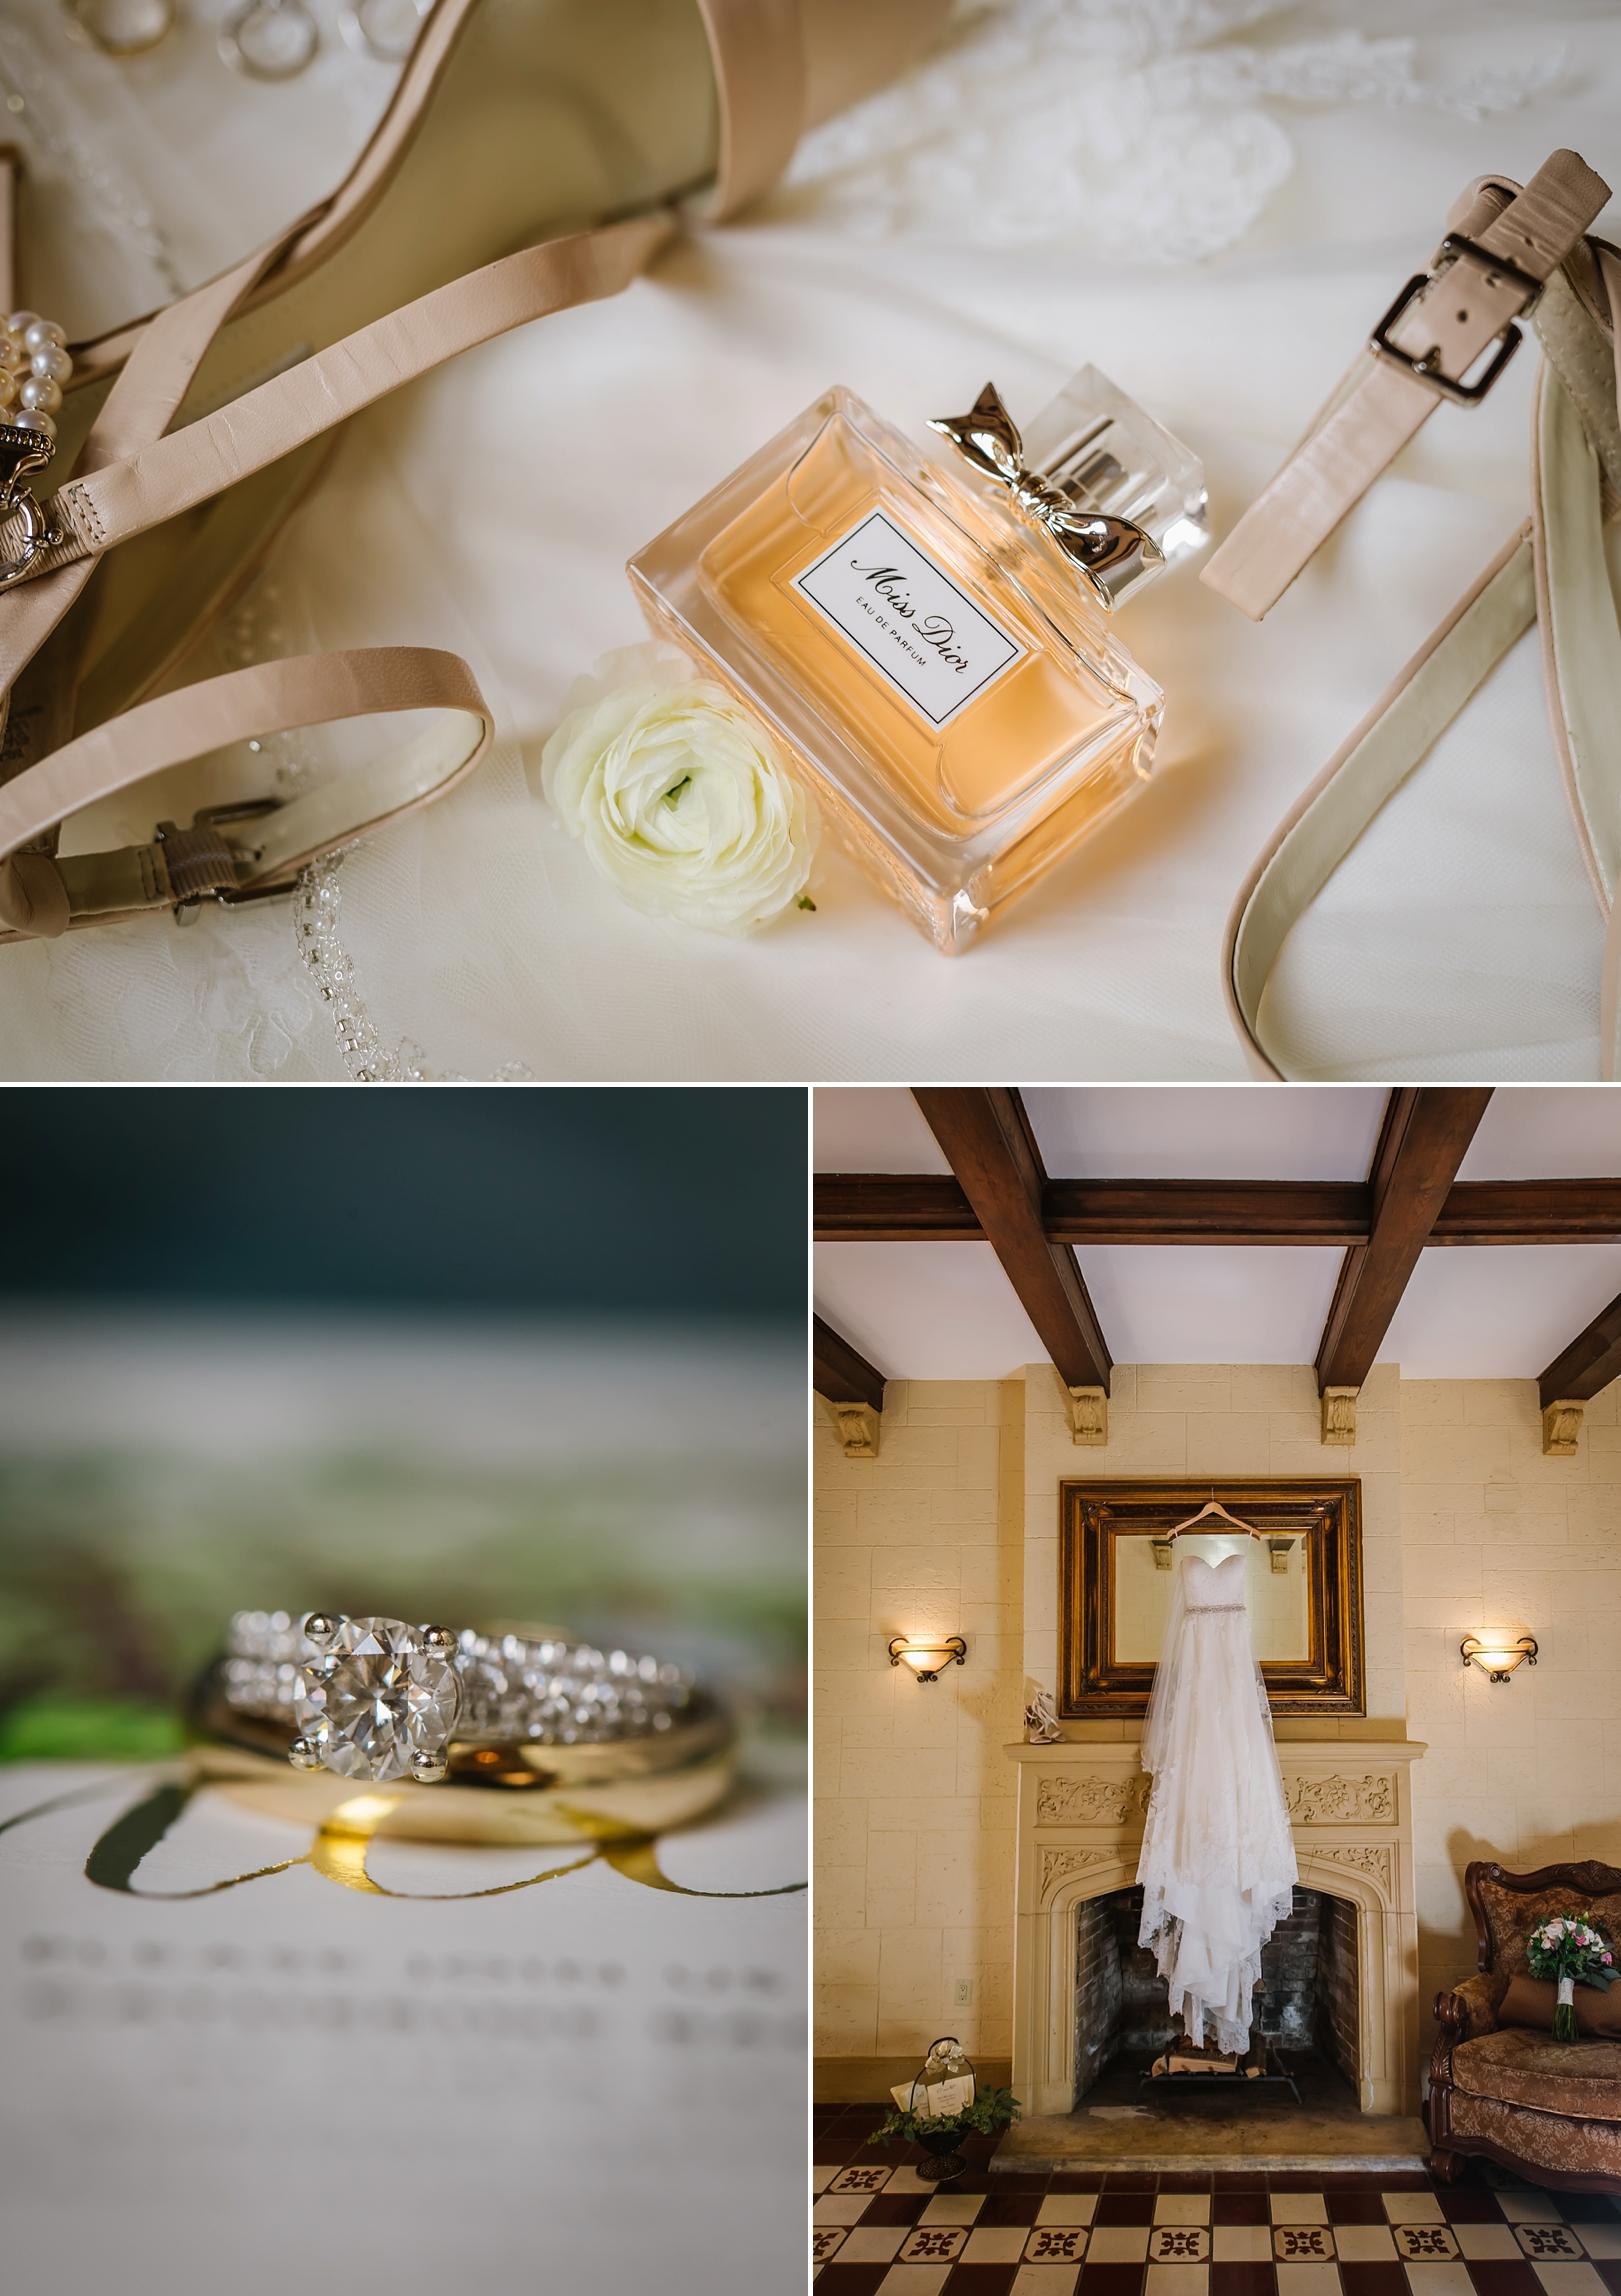 miami-wedding-photography-ashlee-hamon-elegant-vintage-antique-wedding_0001.jpg